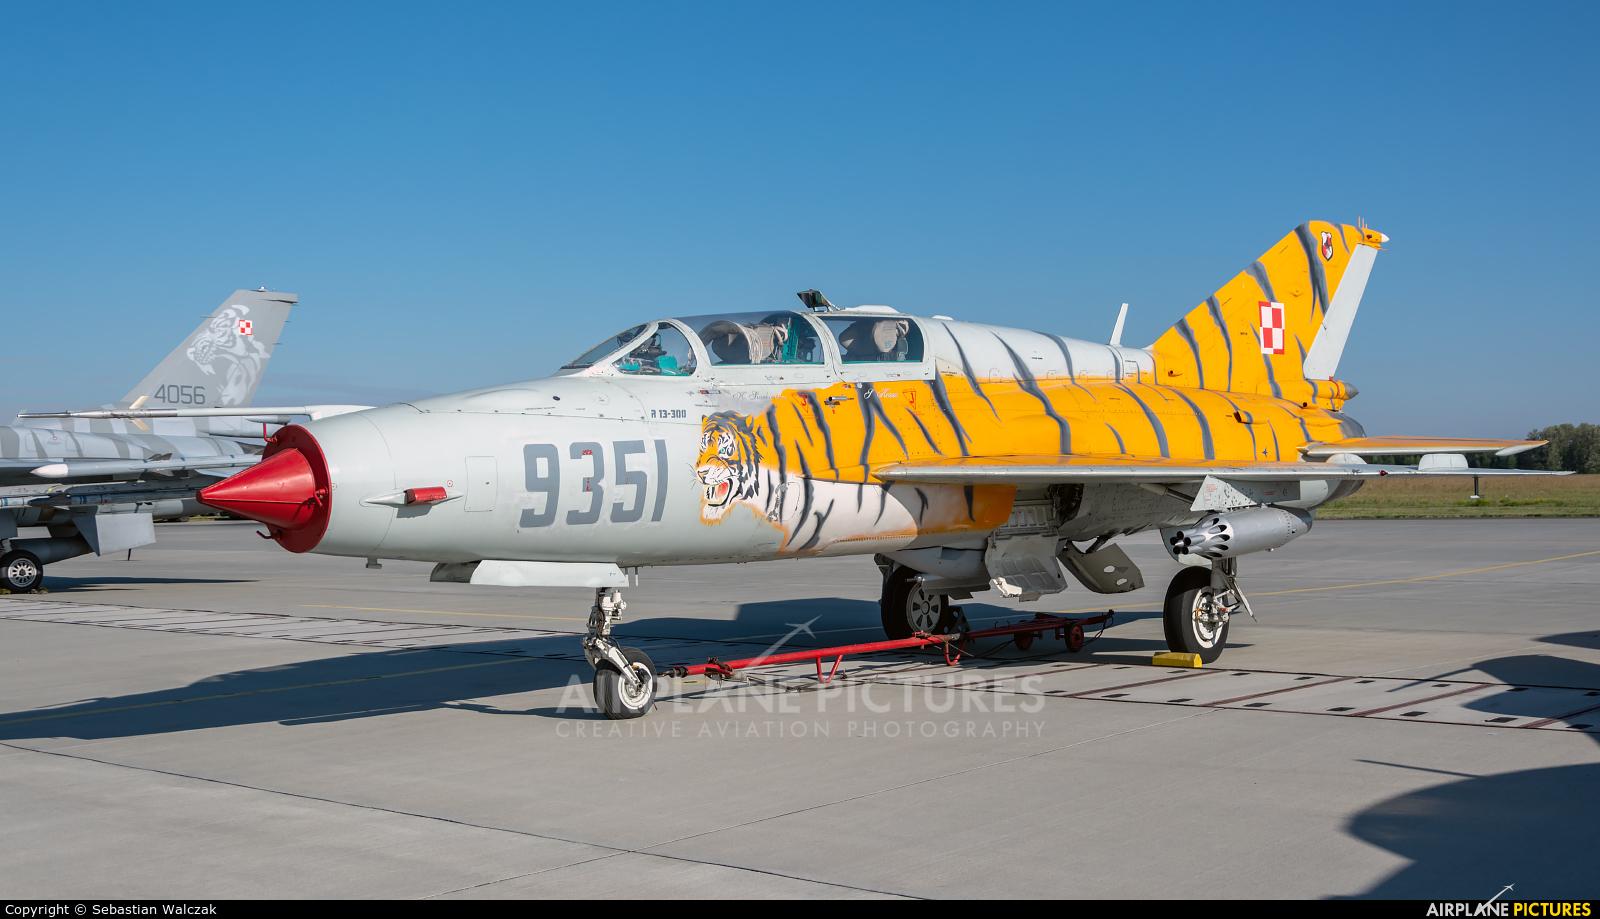 Poland - Air Force 9351 aircraft at Poznań - Krzesiny